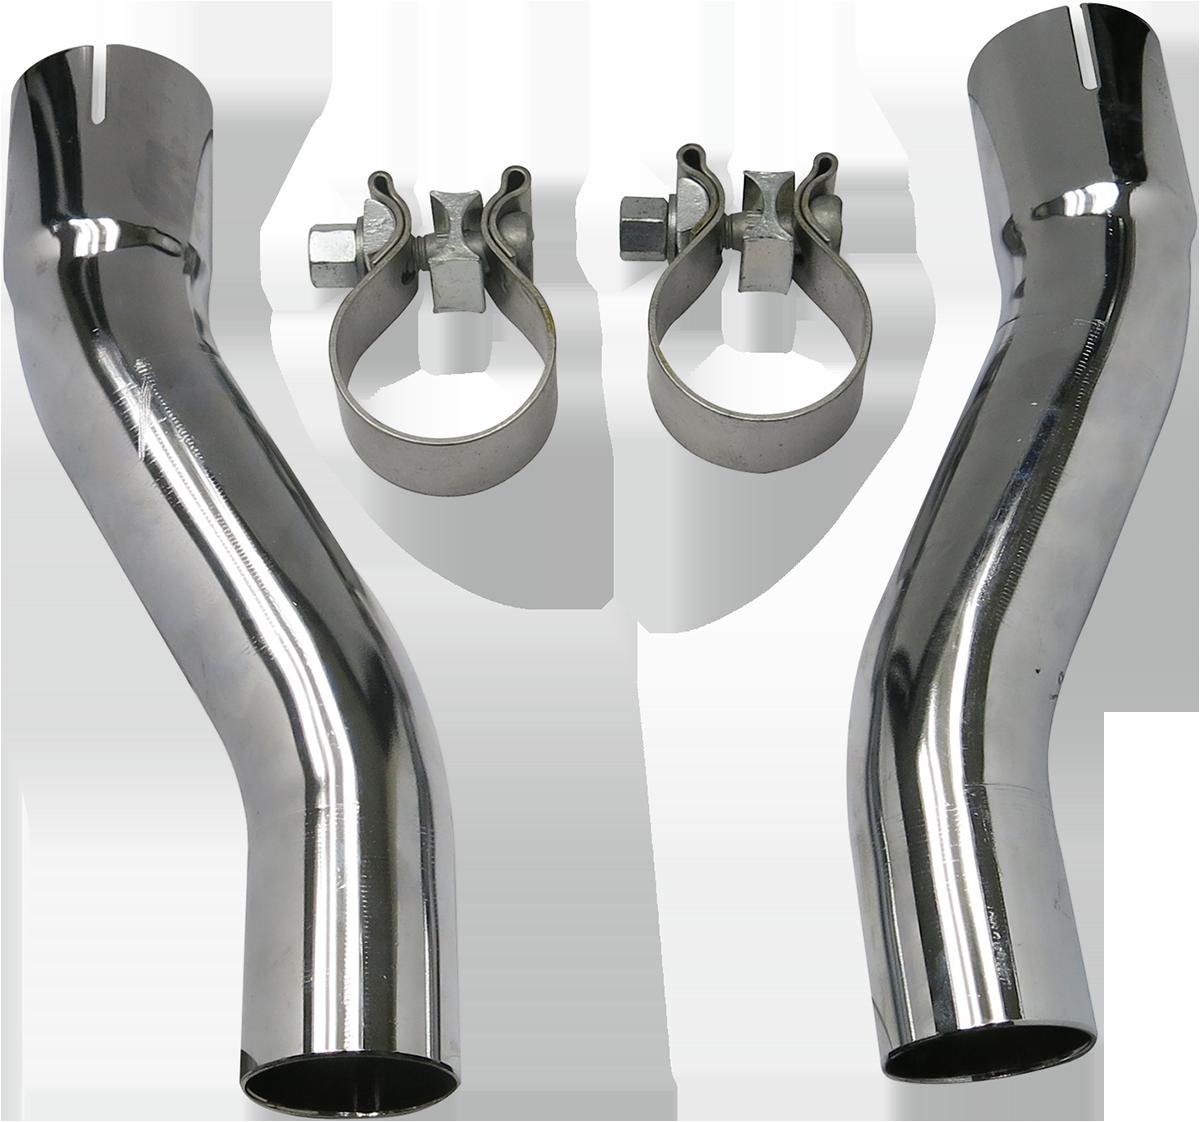 Bassani Chrome Exhaust Muffler Adapter Kit 2009-2016 Harley Trike FLHX FLHTCUTG